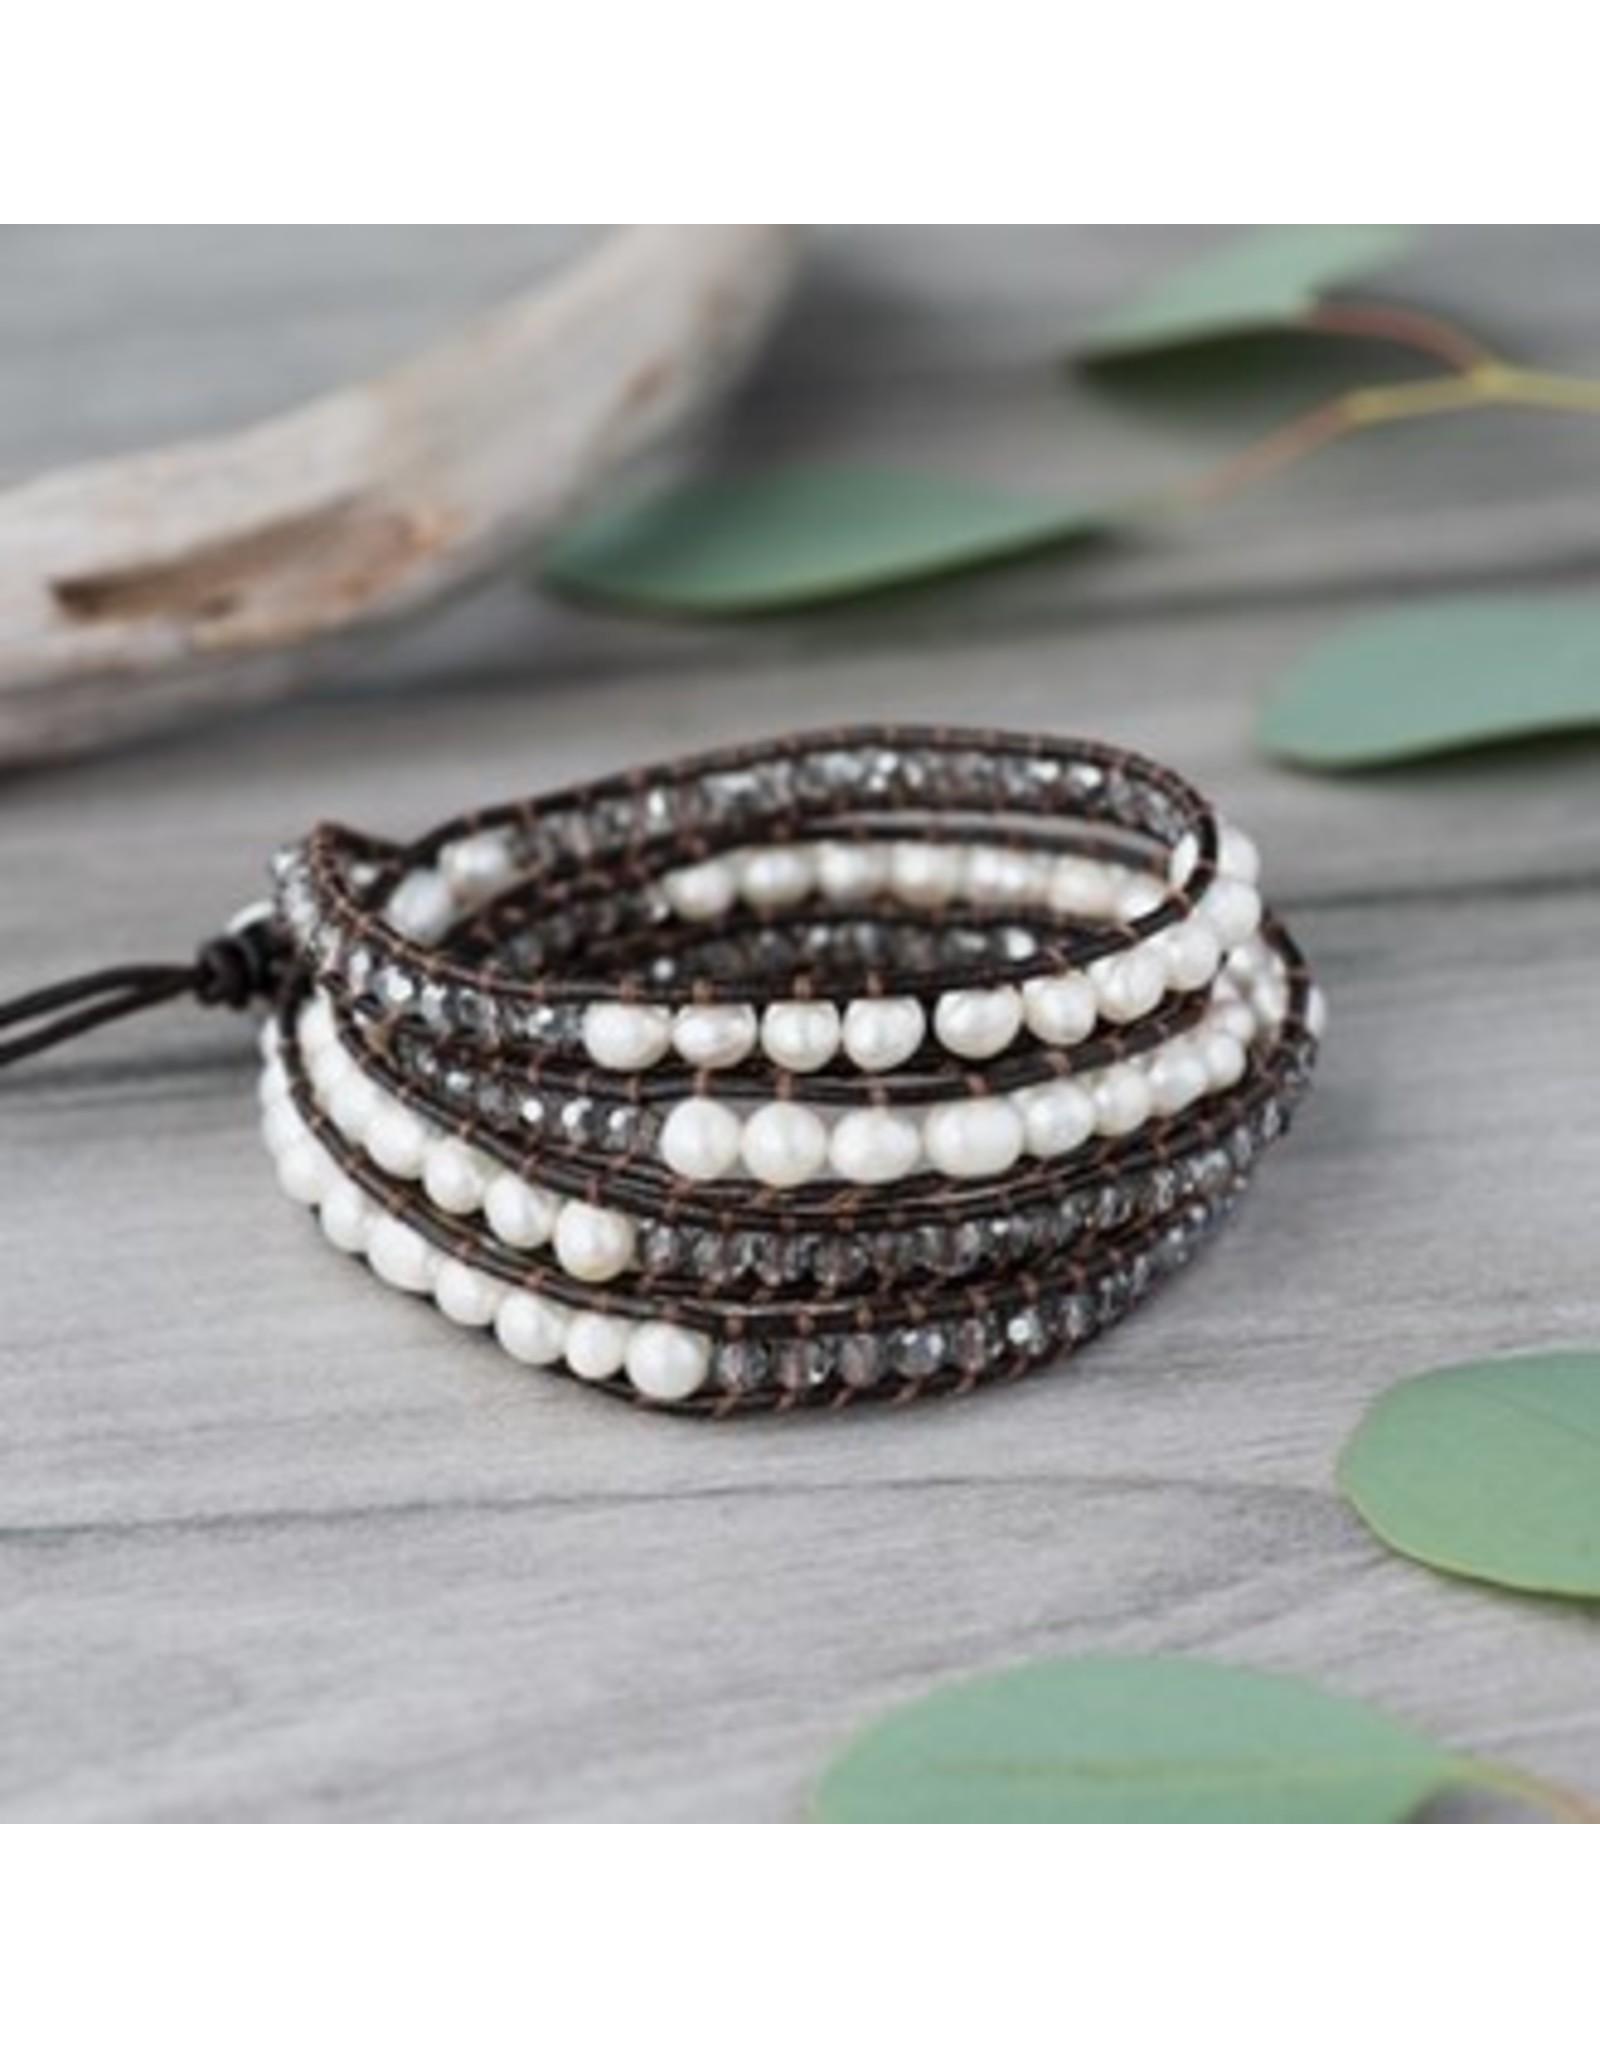 Glee jewelry A Typical Wrap Bracelet/Brown/Smoke, White Pearl